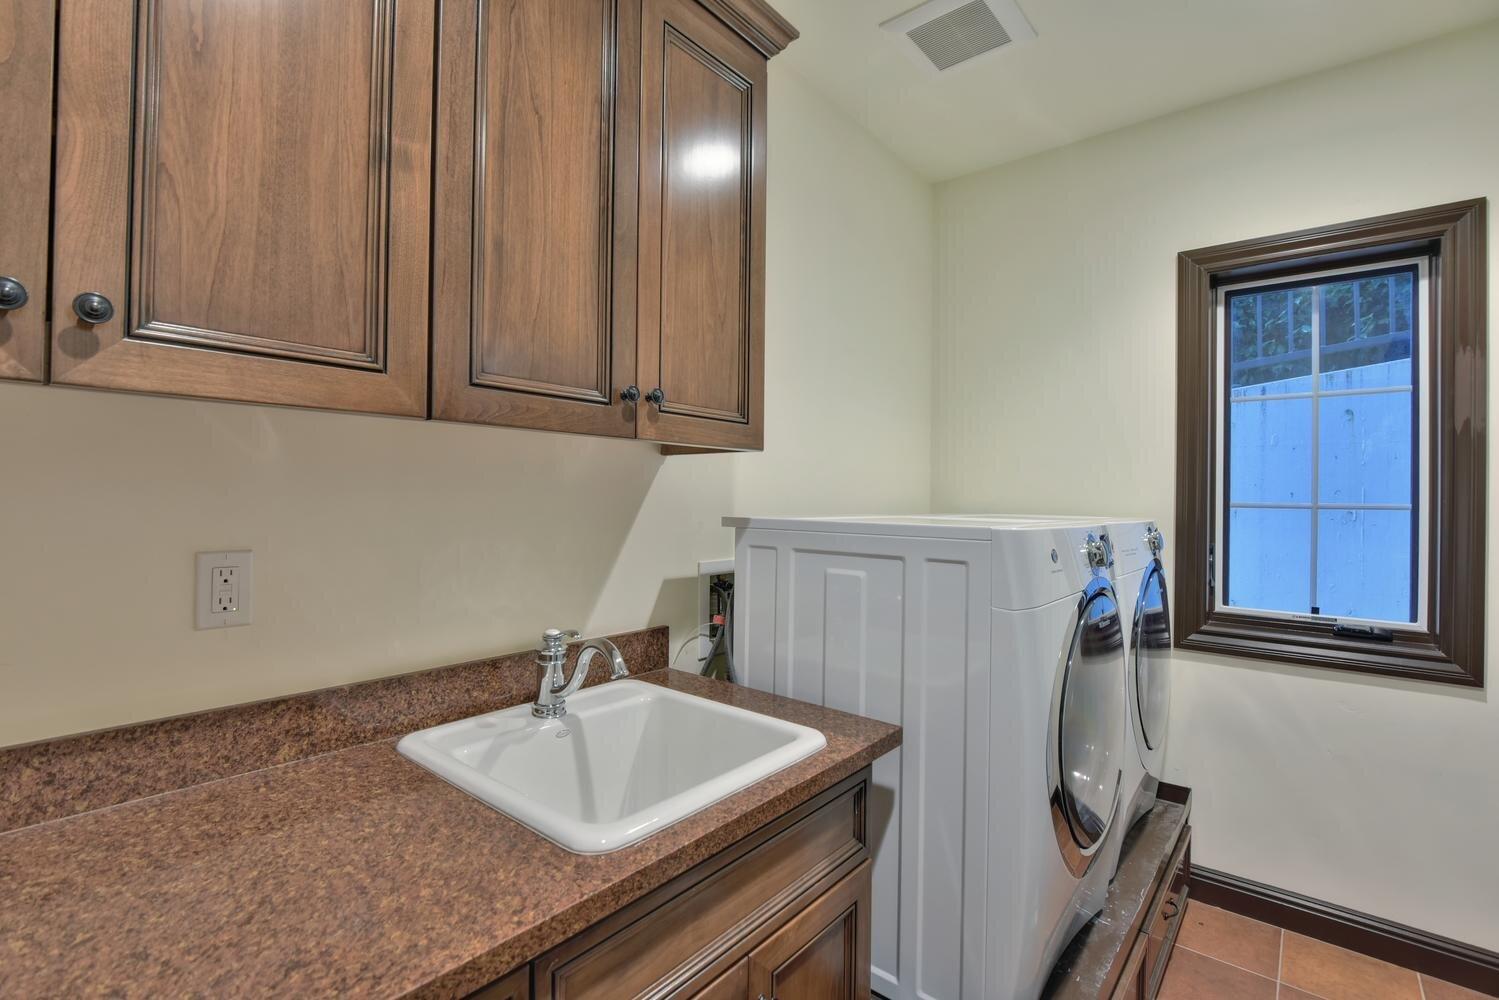 16021 Winterbrook Rd Los Gatos-large-030-028-Laundry Room-1499x1000-72dpi.jpg